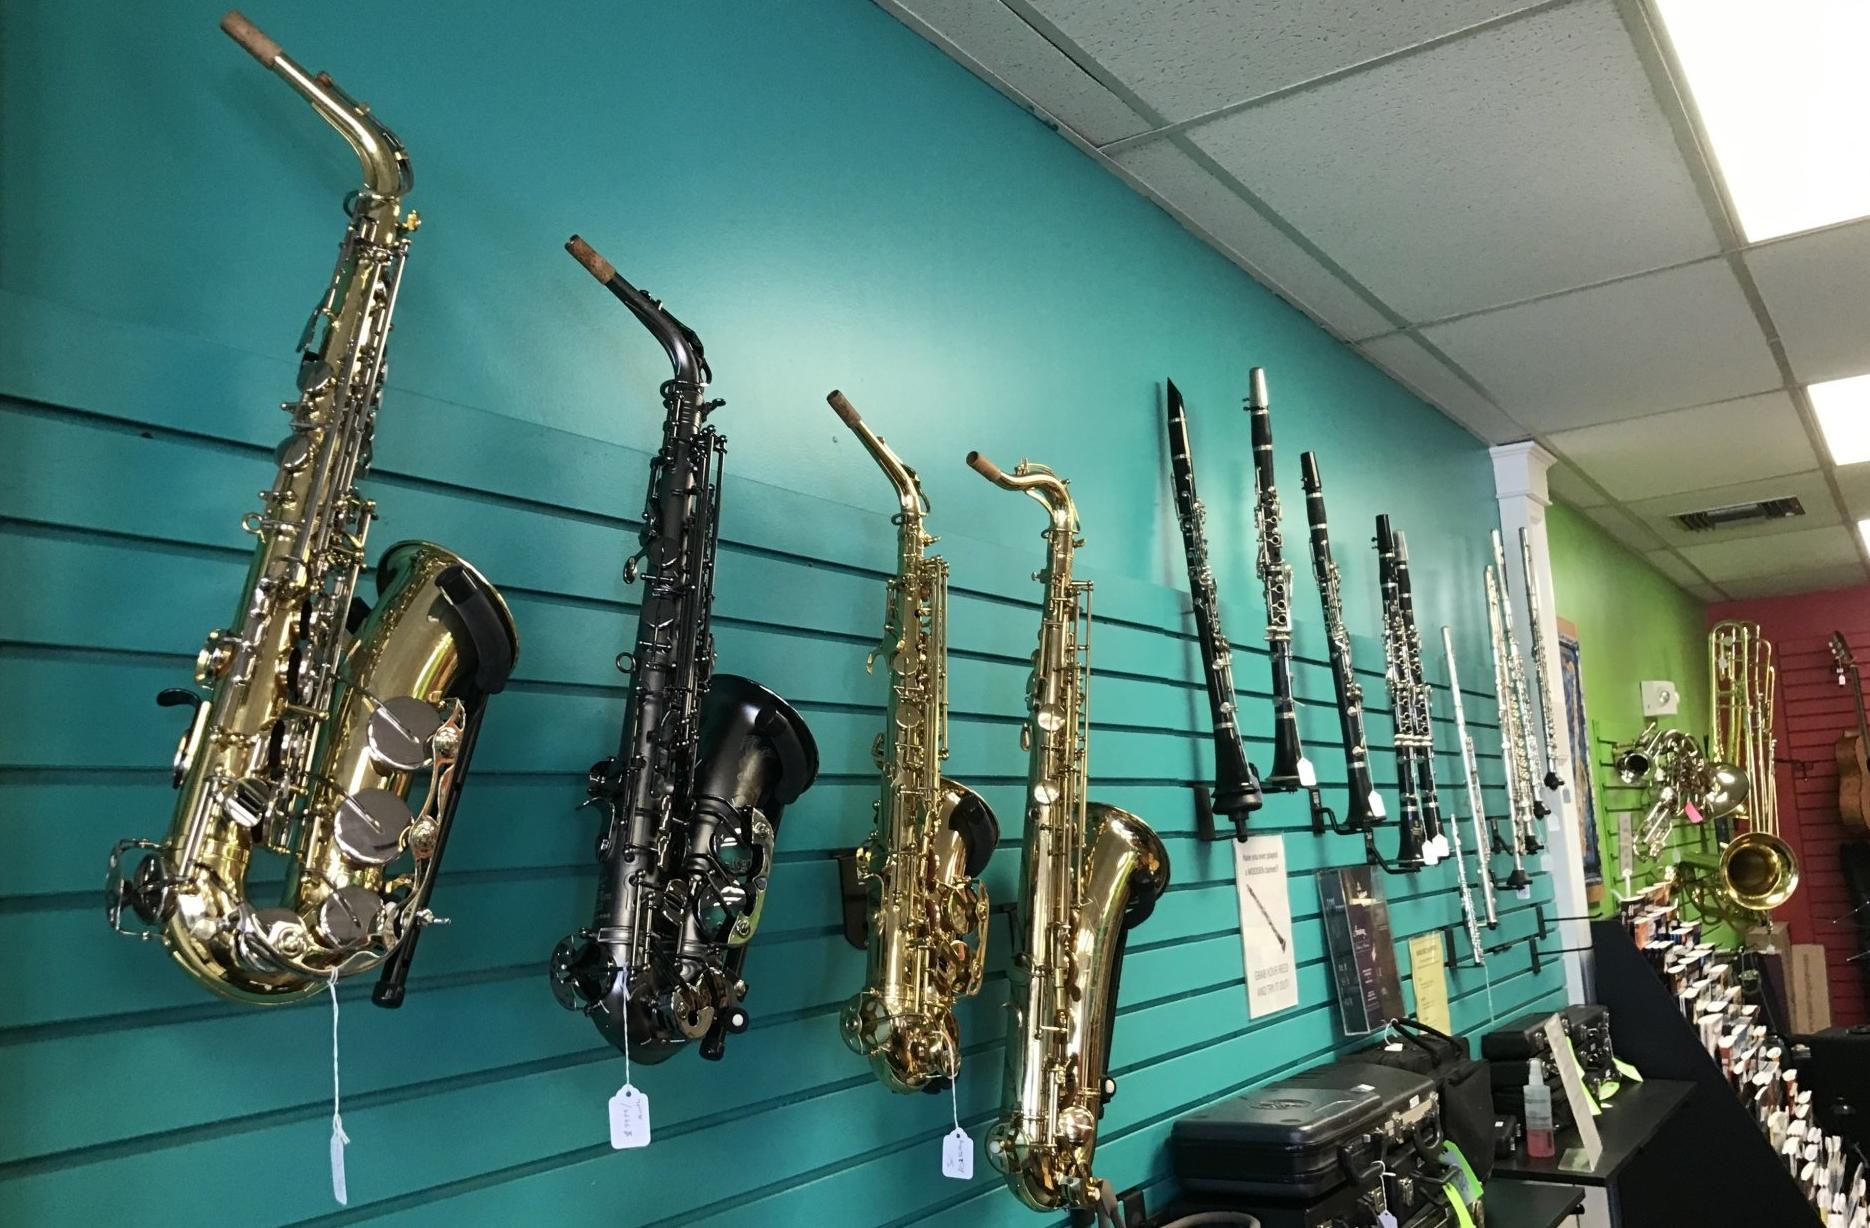 Music Scene | Music Store | Piano Lessons | Guitar Lessons Andover, KS